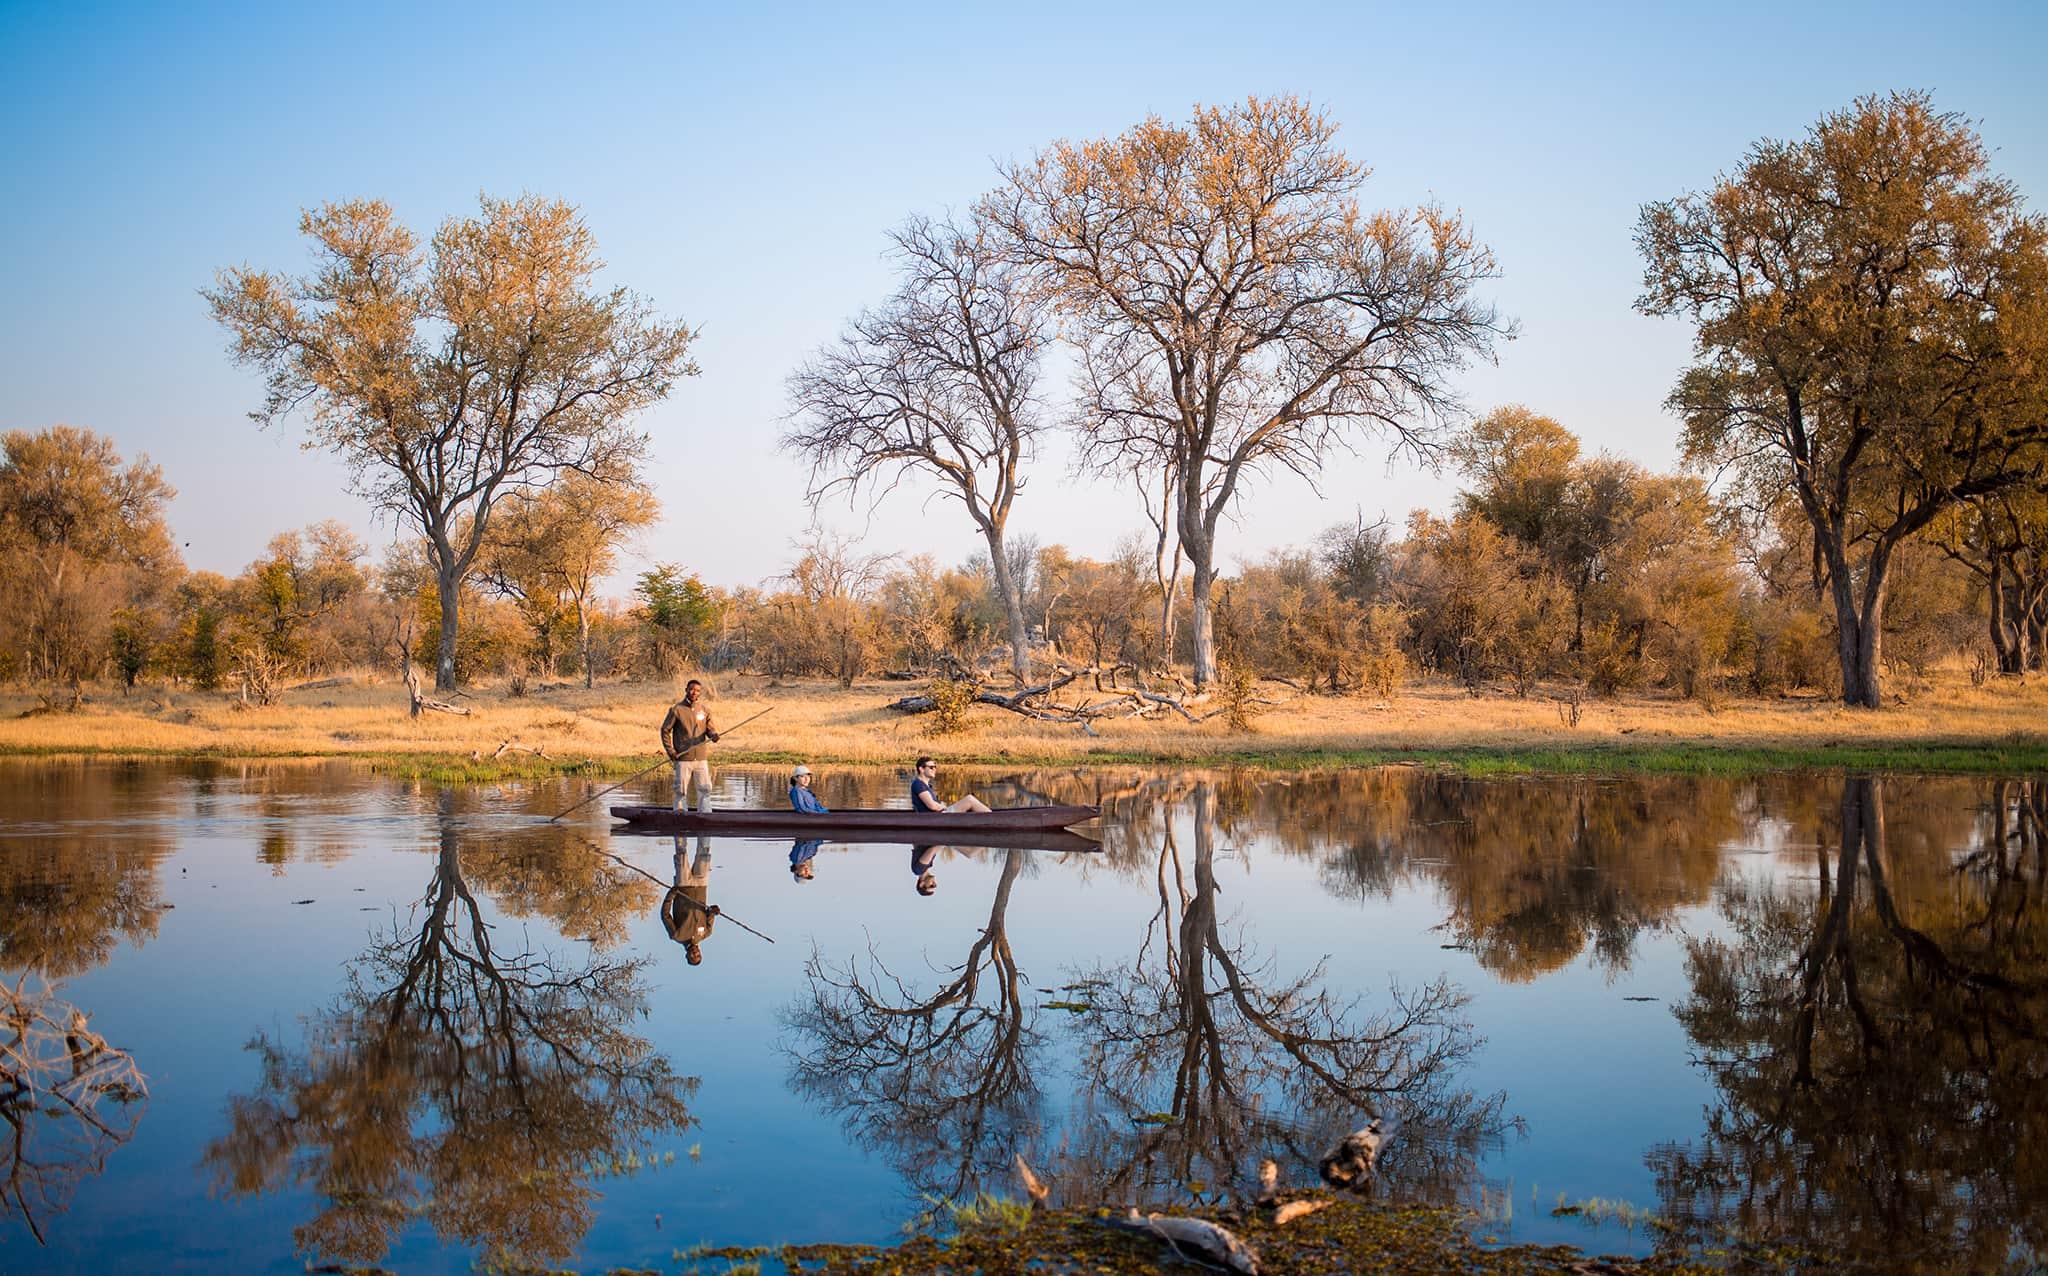 Safari on a mokoro boat on the Okavango Delta in Botswana